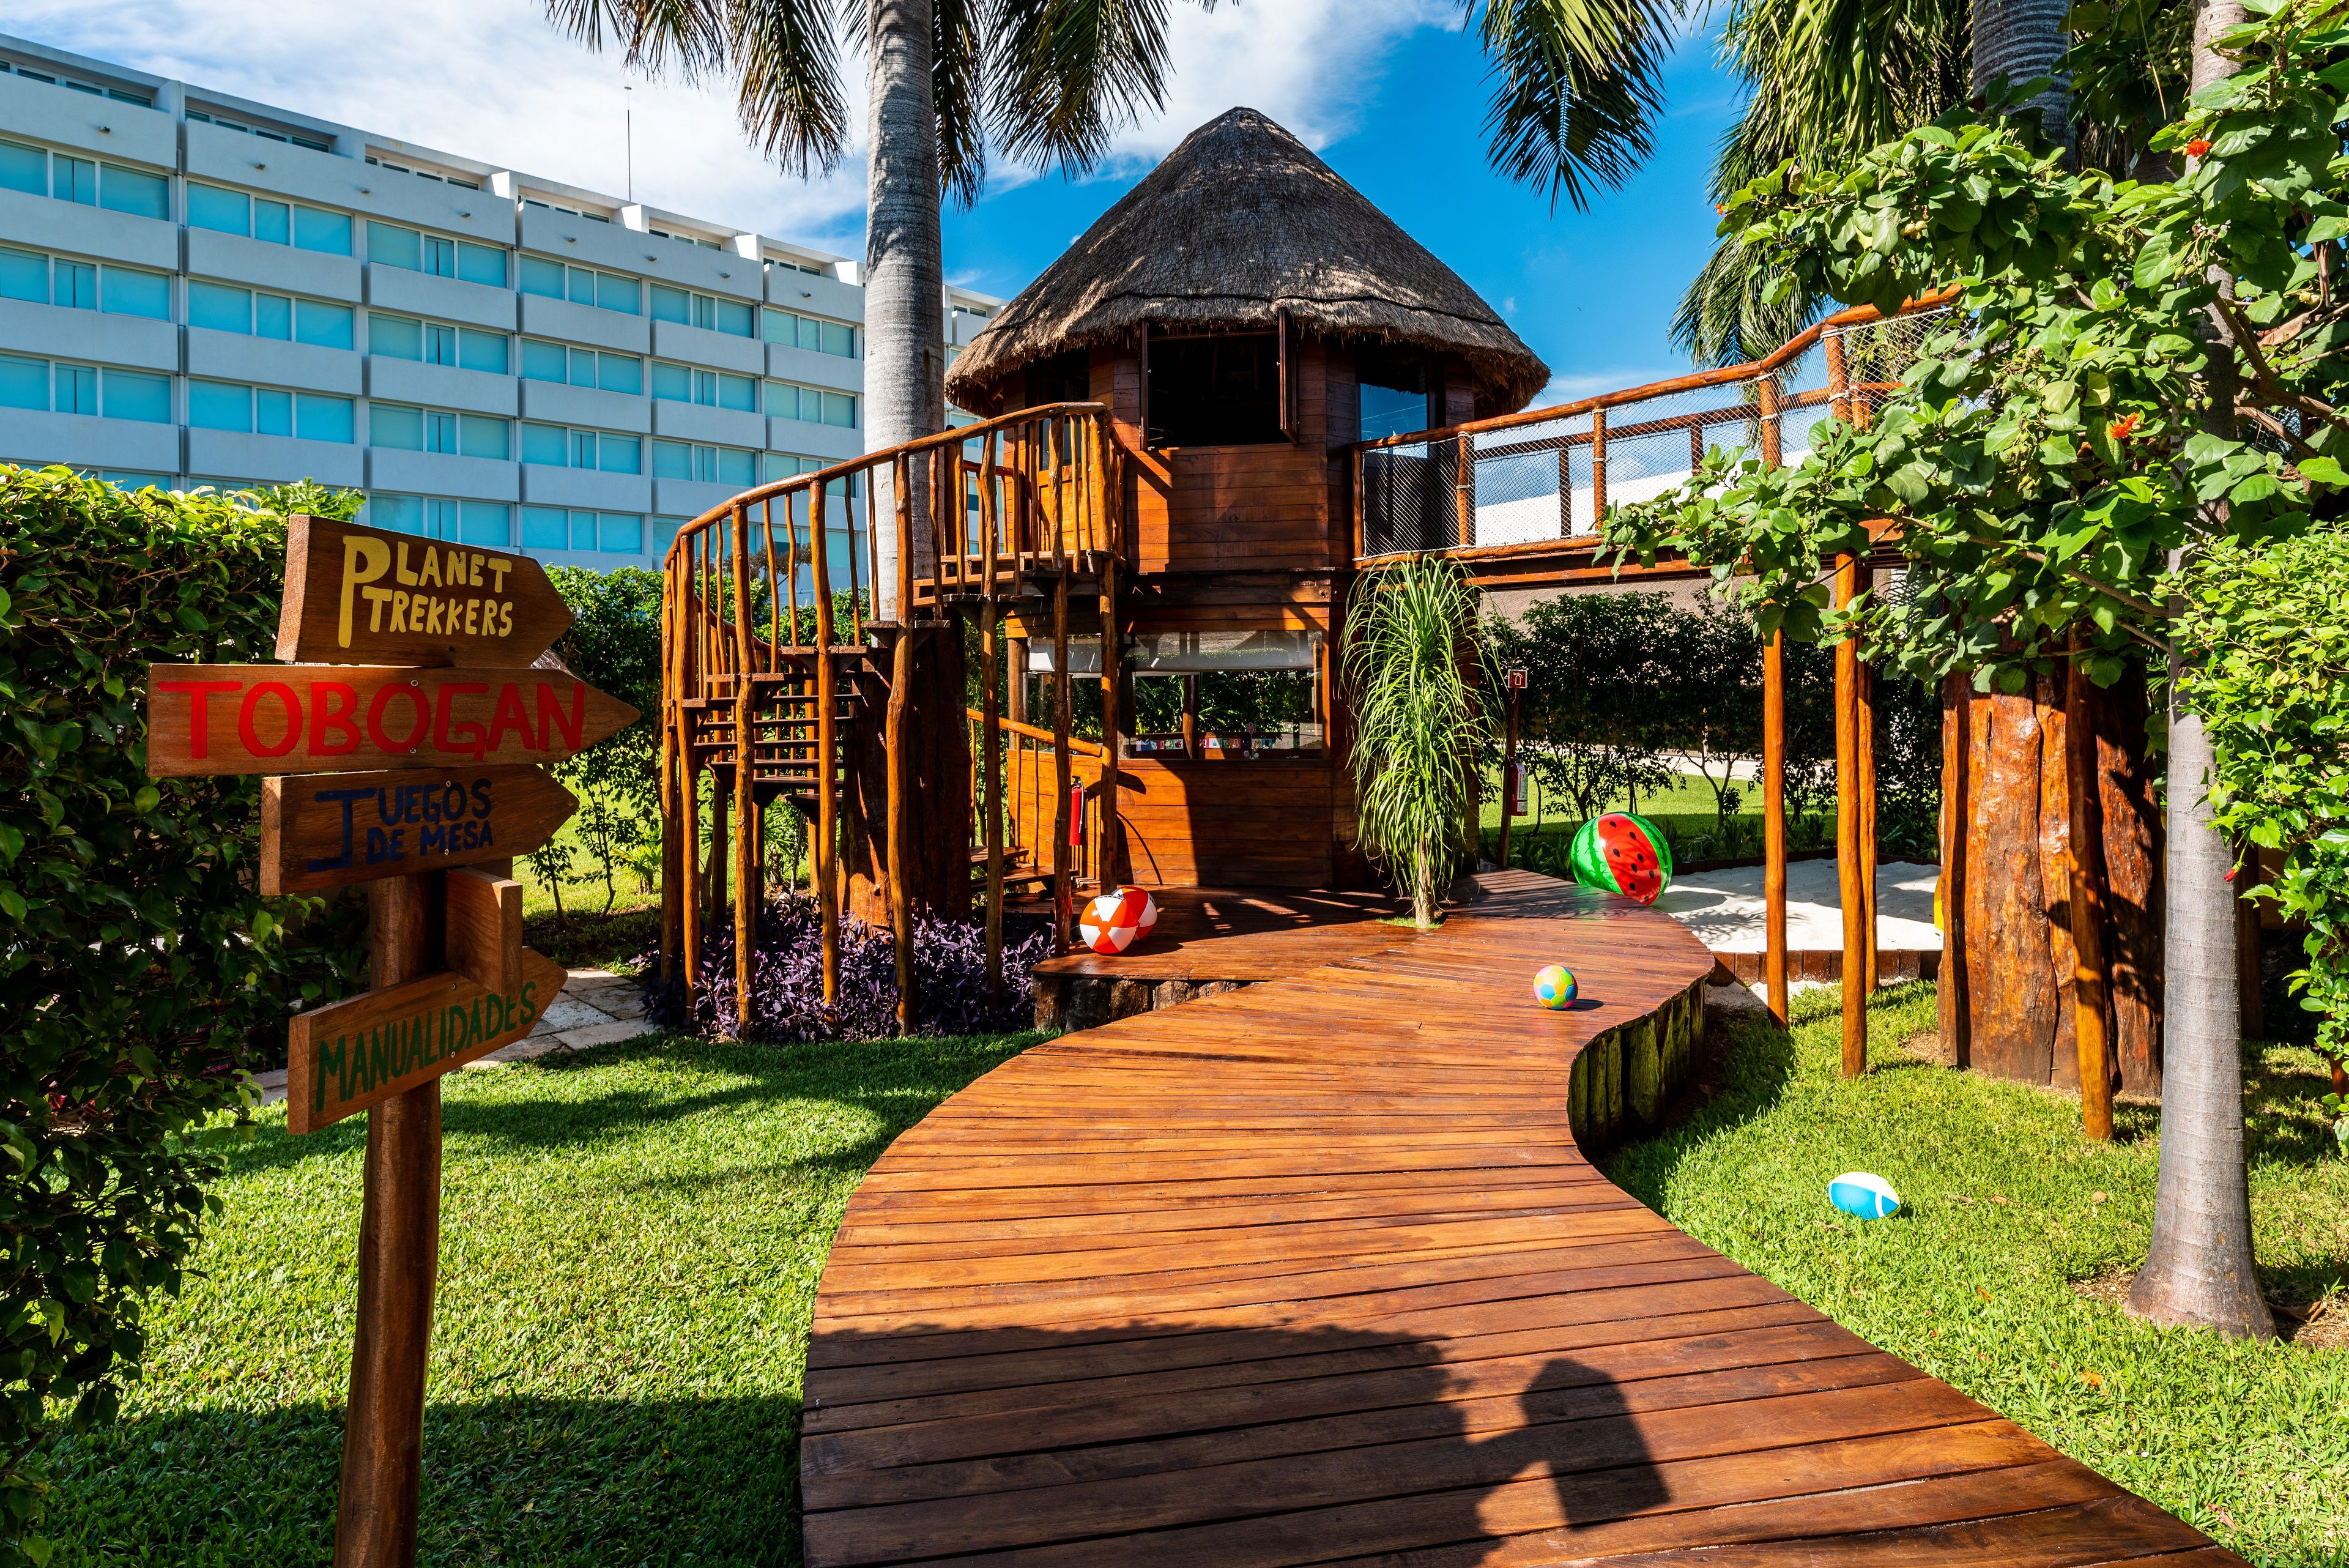 Fotos de InterContinental Presidente Cancun Resort